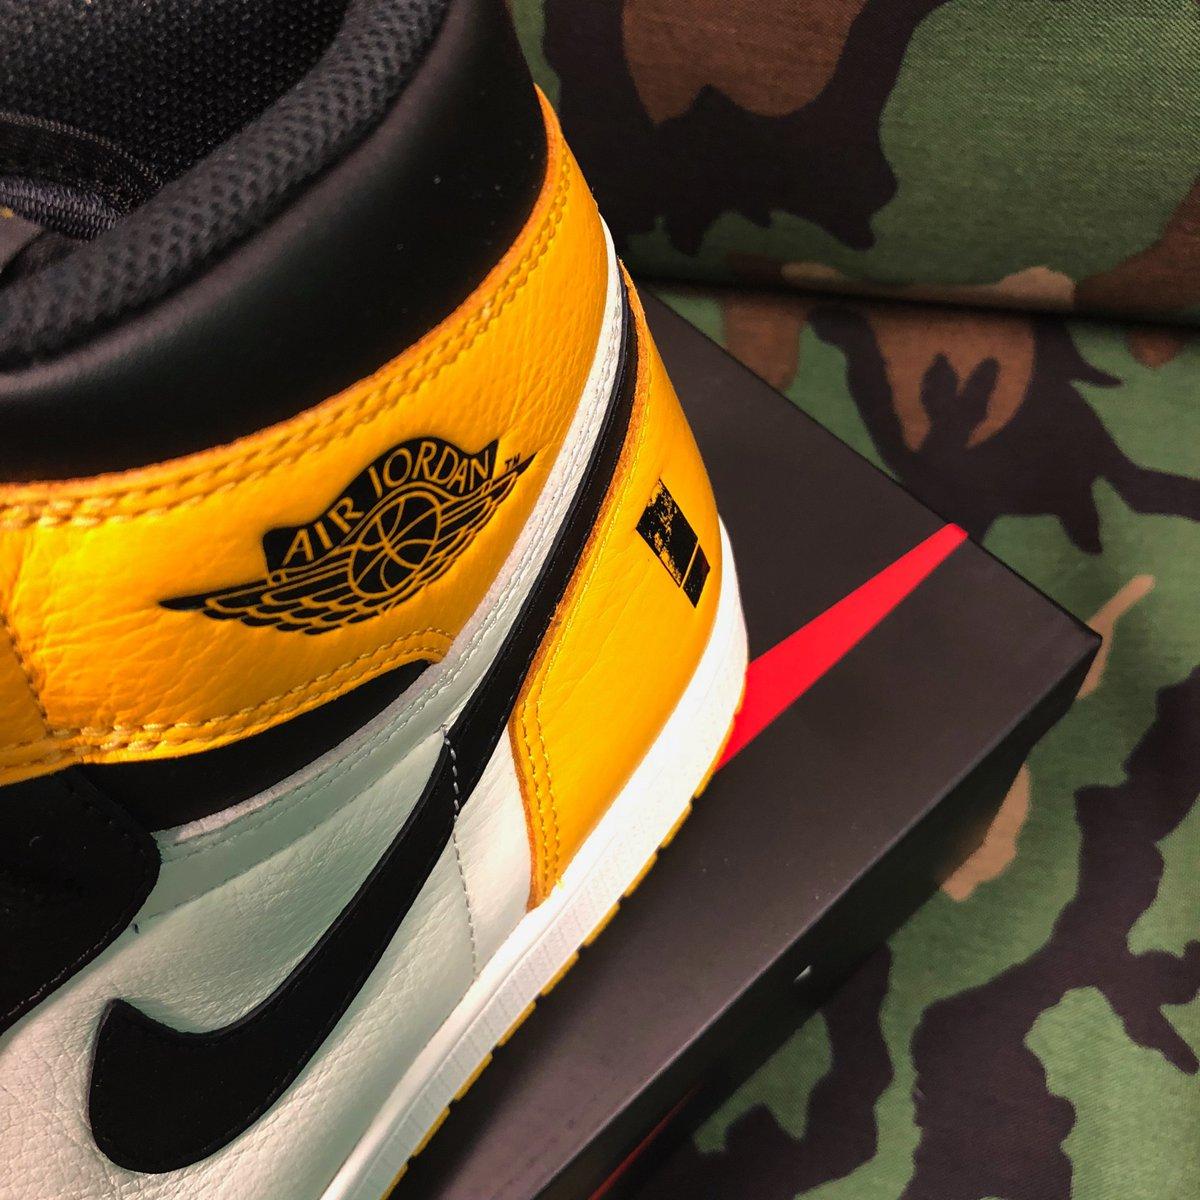 Shinedown Air Jordan 1 Attention Attention Sneaker Bar